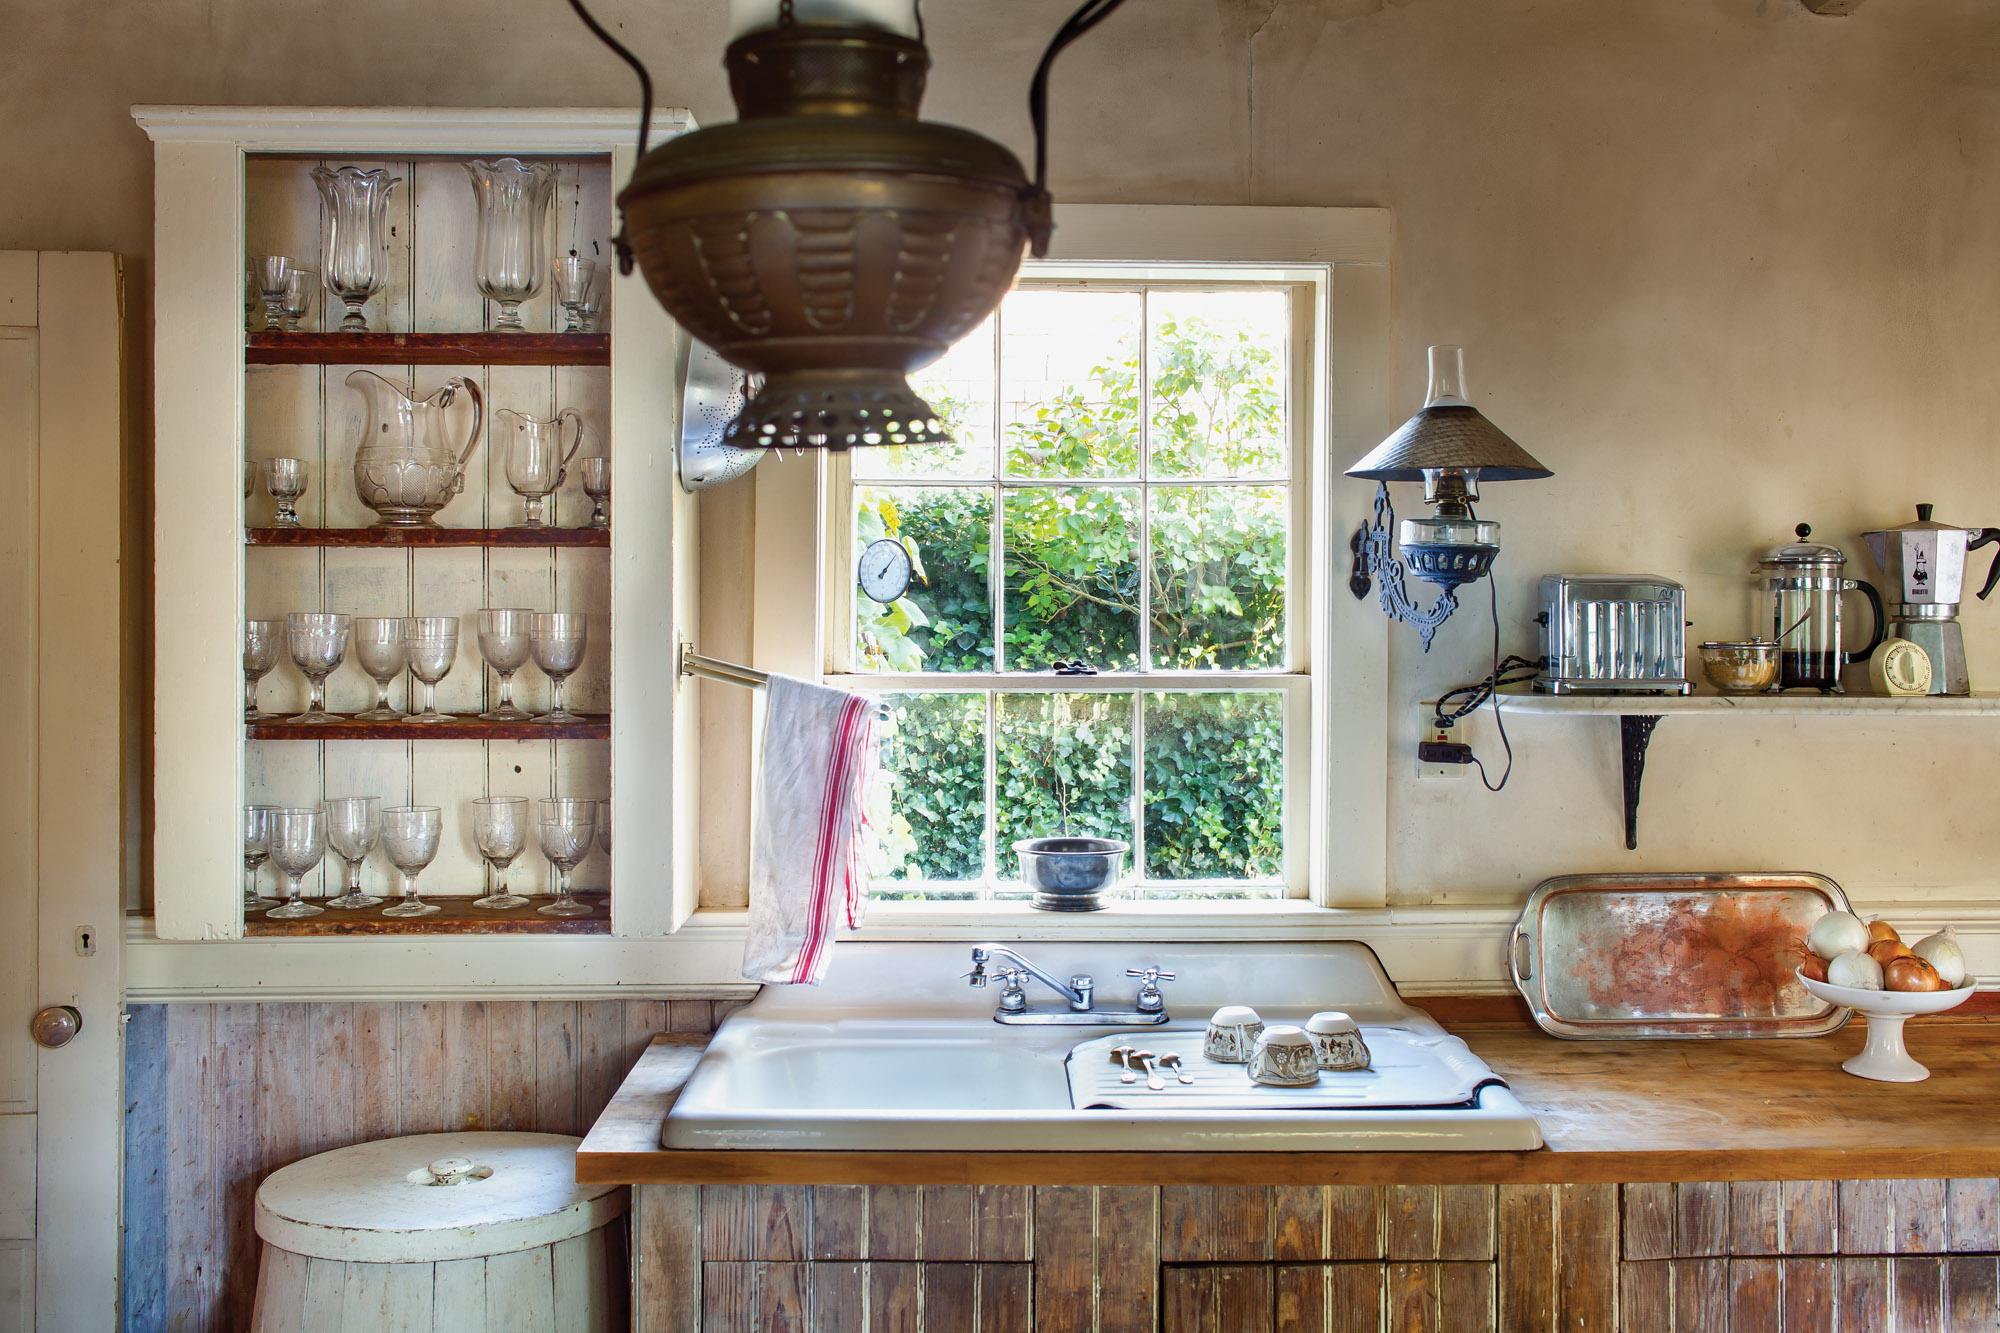 cottage kitchen, general store kerosene lamp